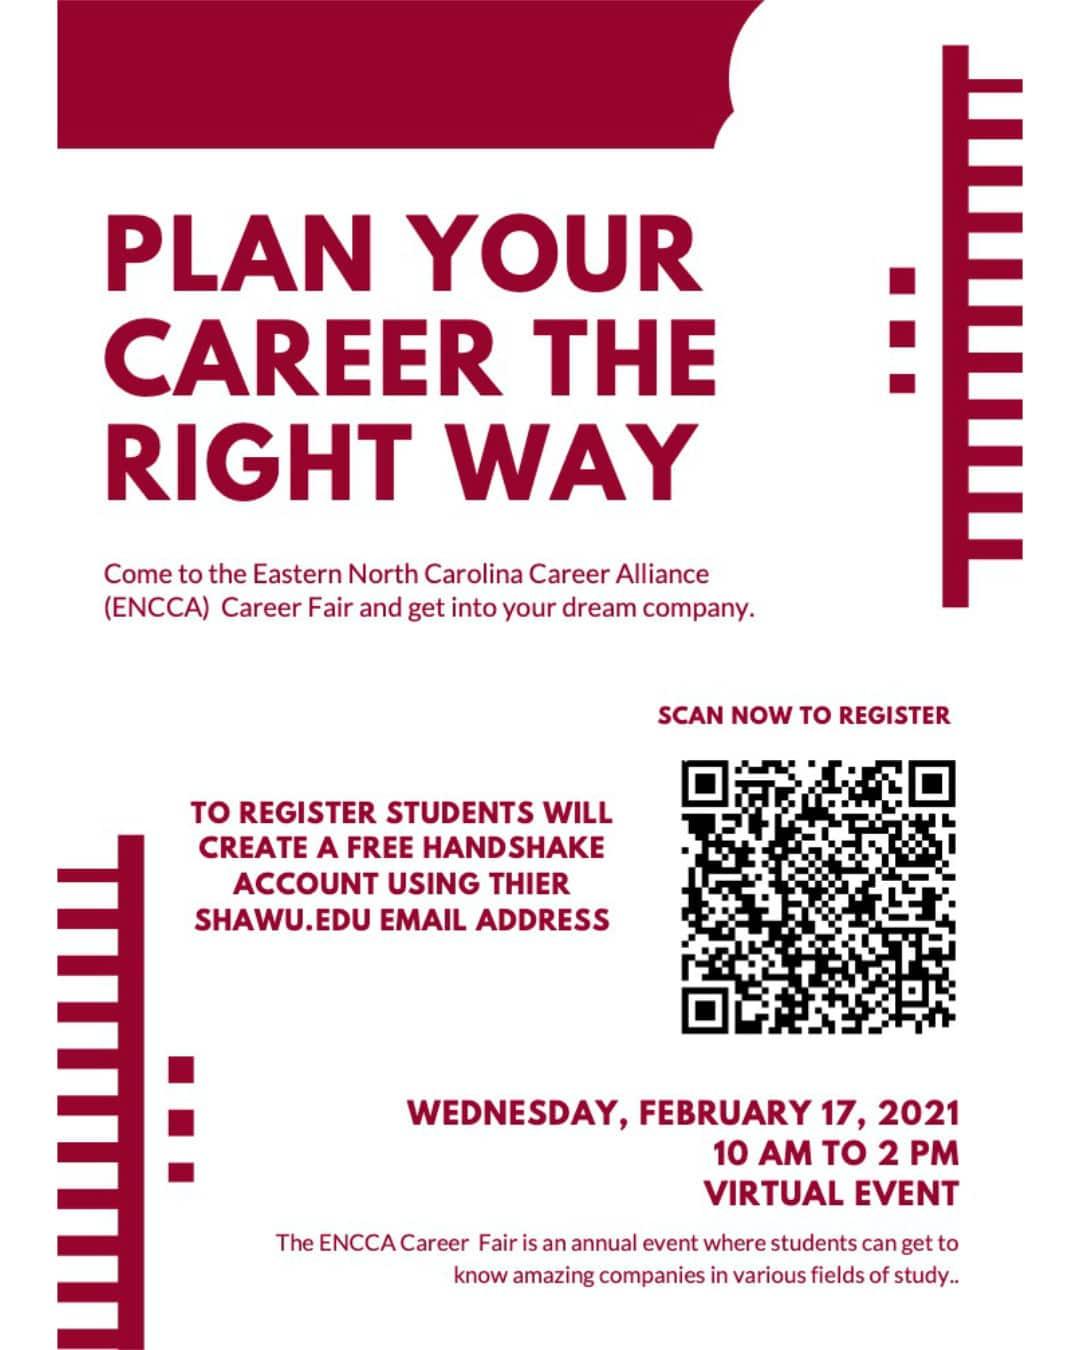 Experiential Learning and Career Development Center - ENCCA Virtual Career Fair